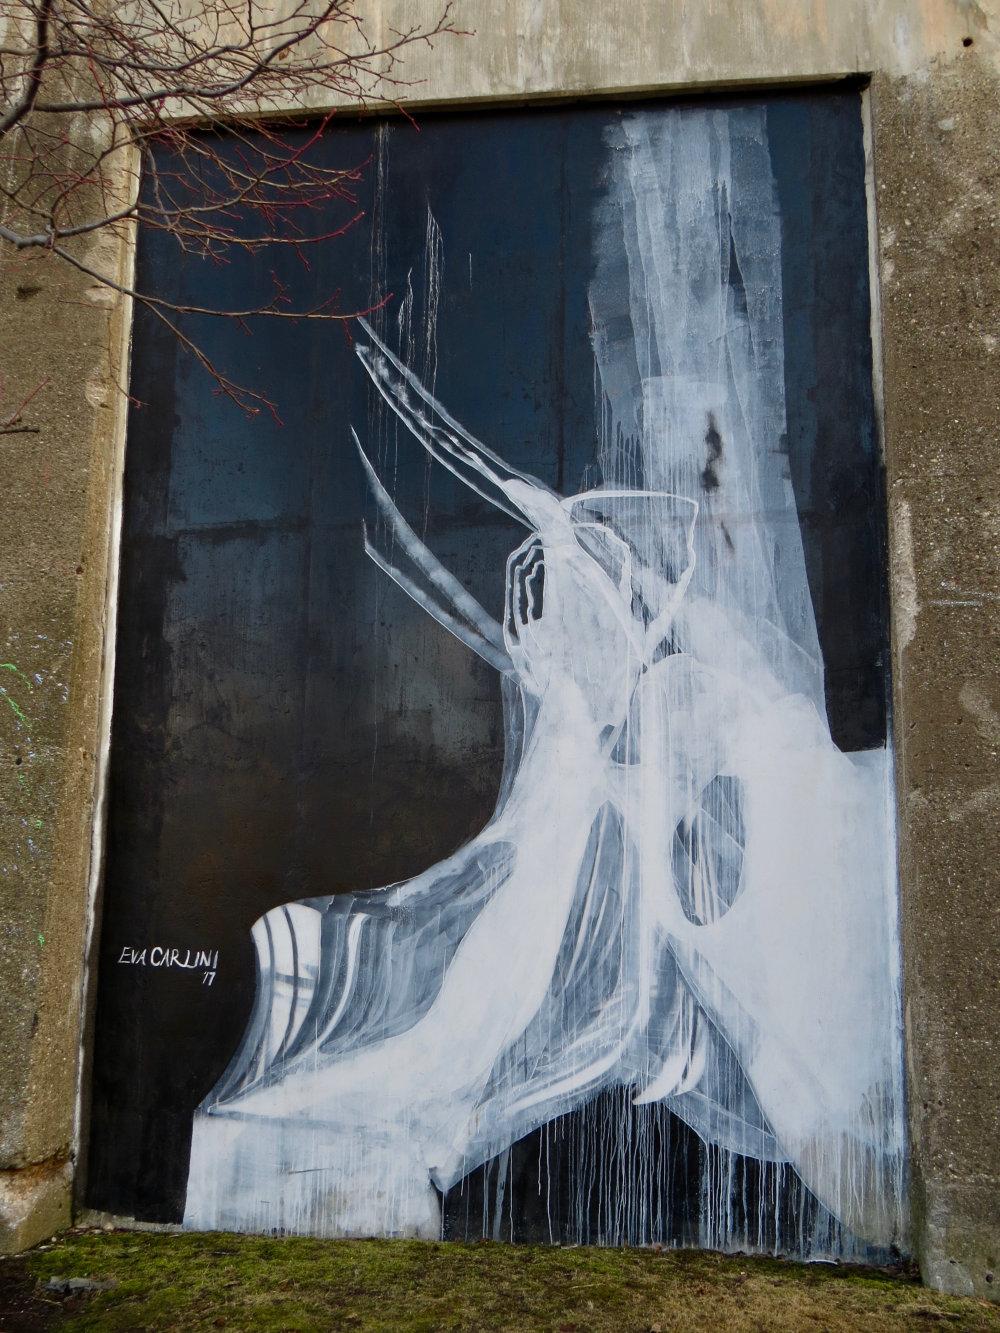 mural in Chicago by artist Eva Carlini